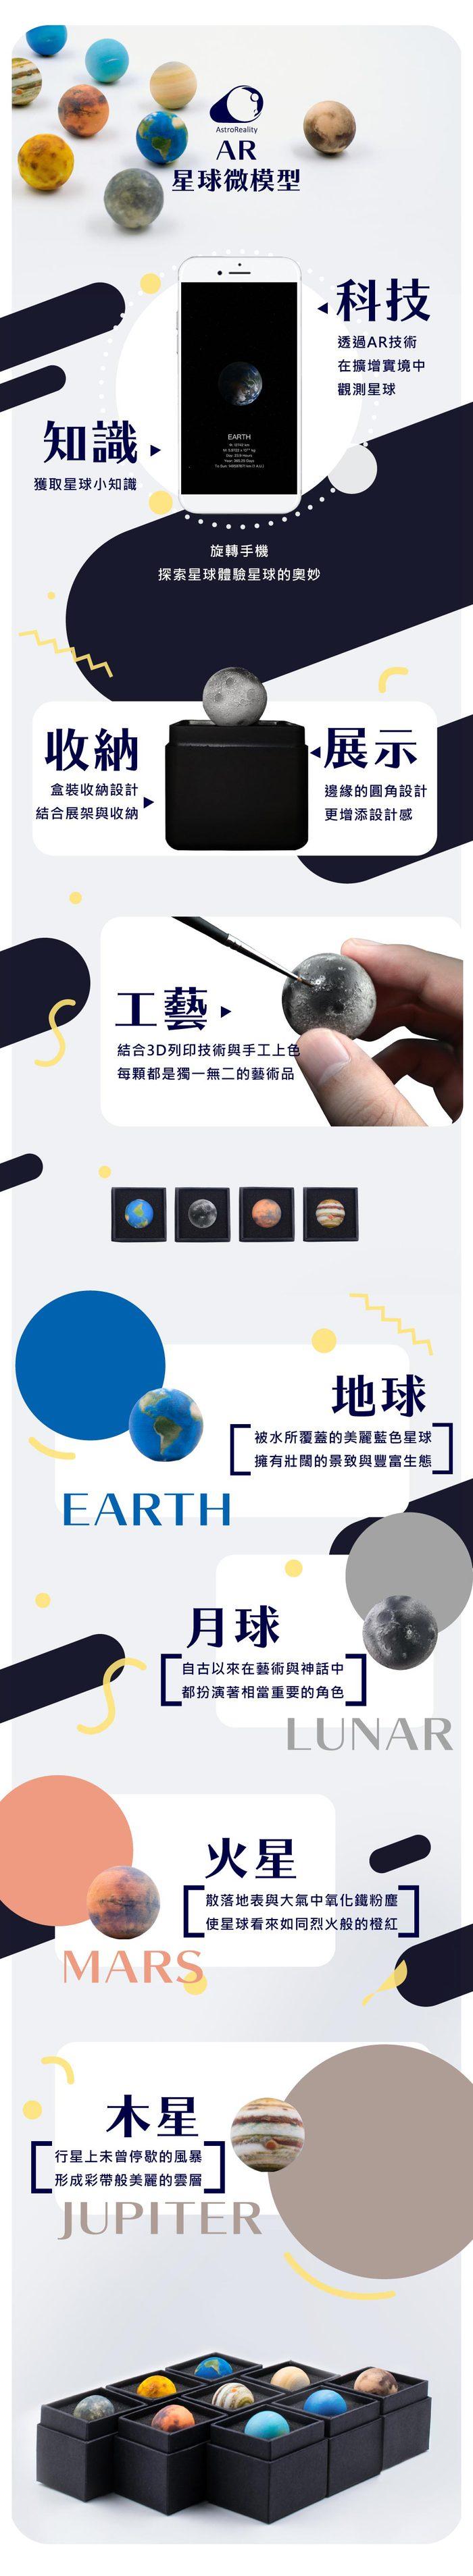 (複製)Astroreality|AR 月球筆記本